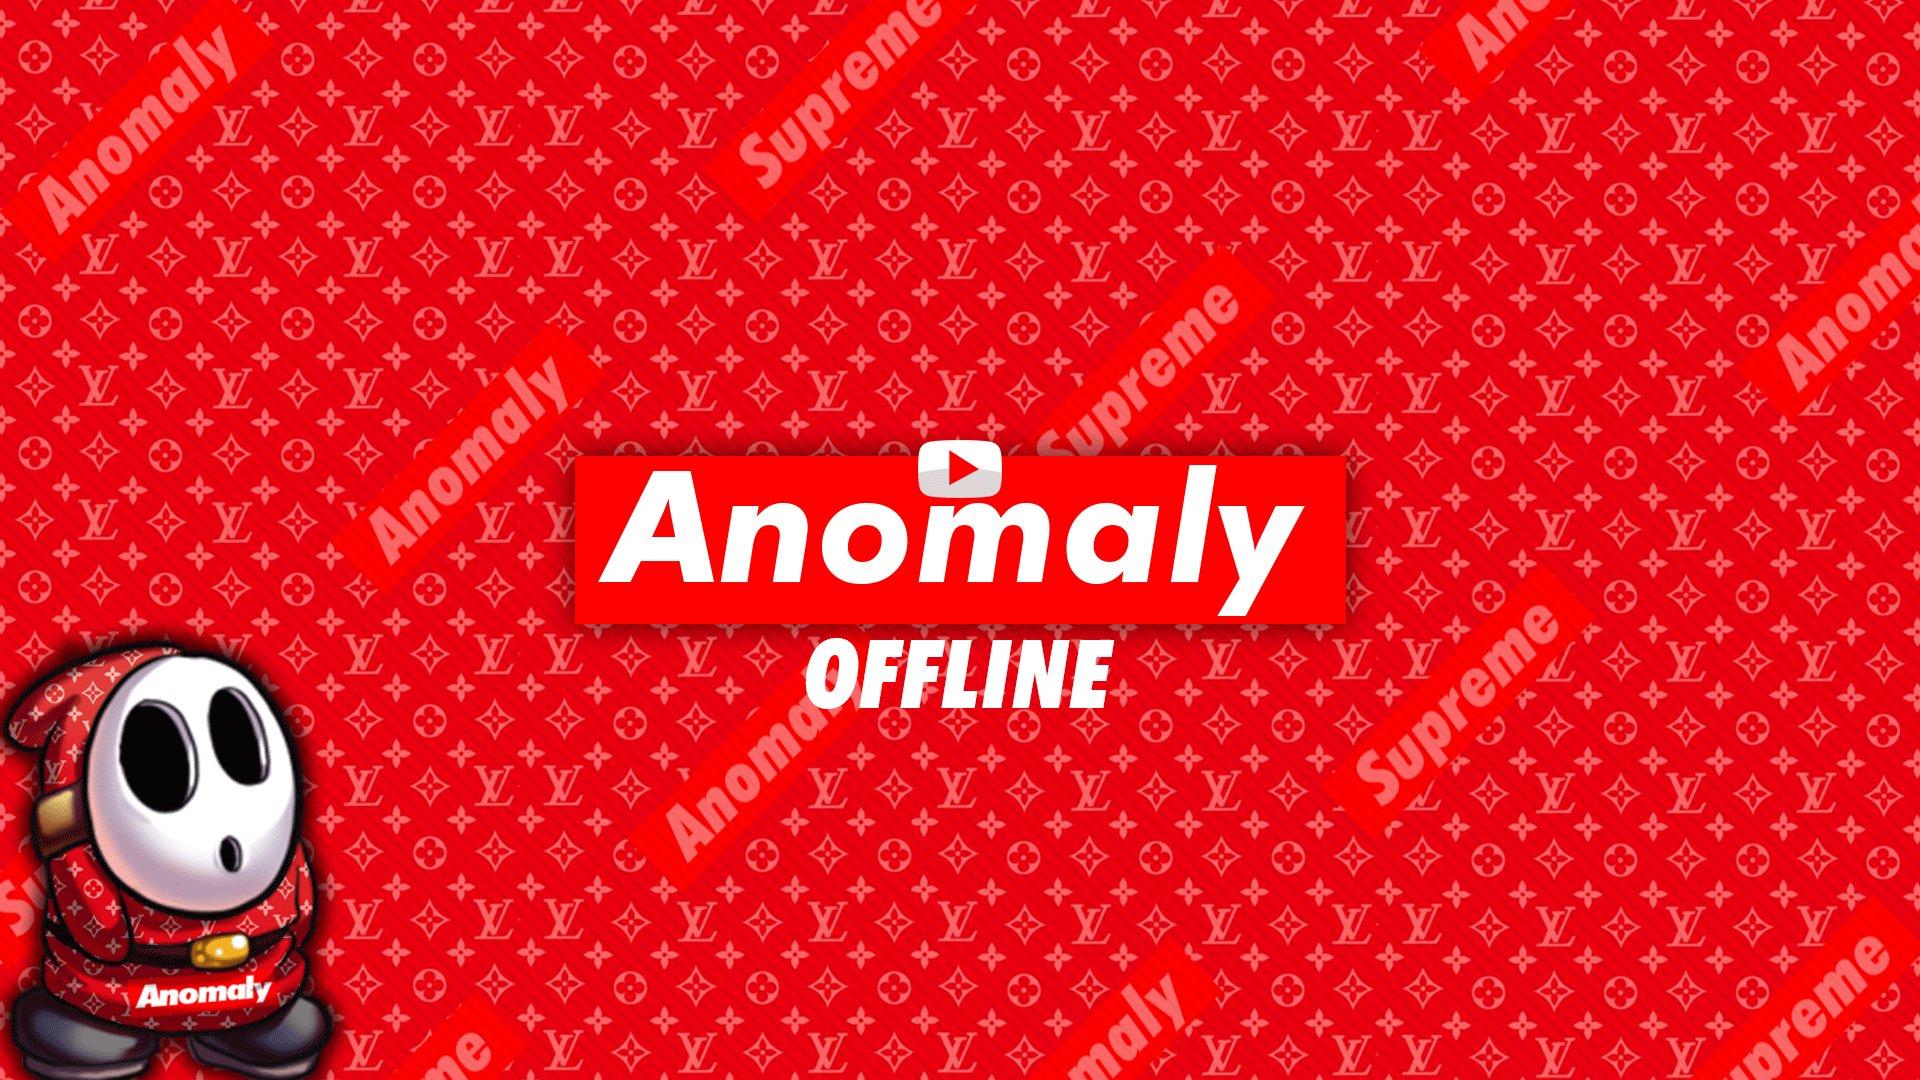 Twitch stream of Anomaly